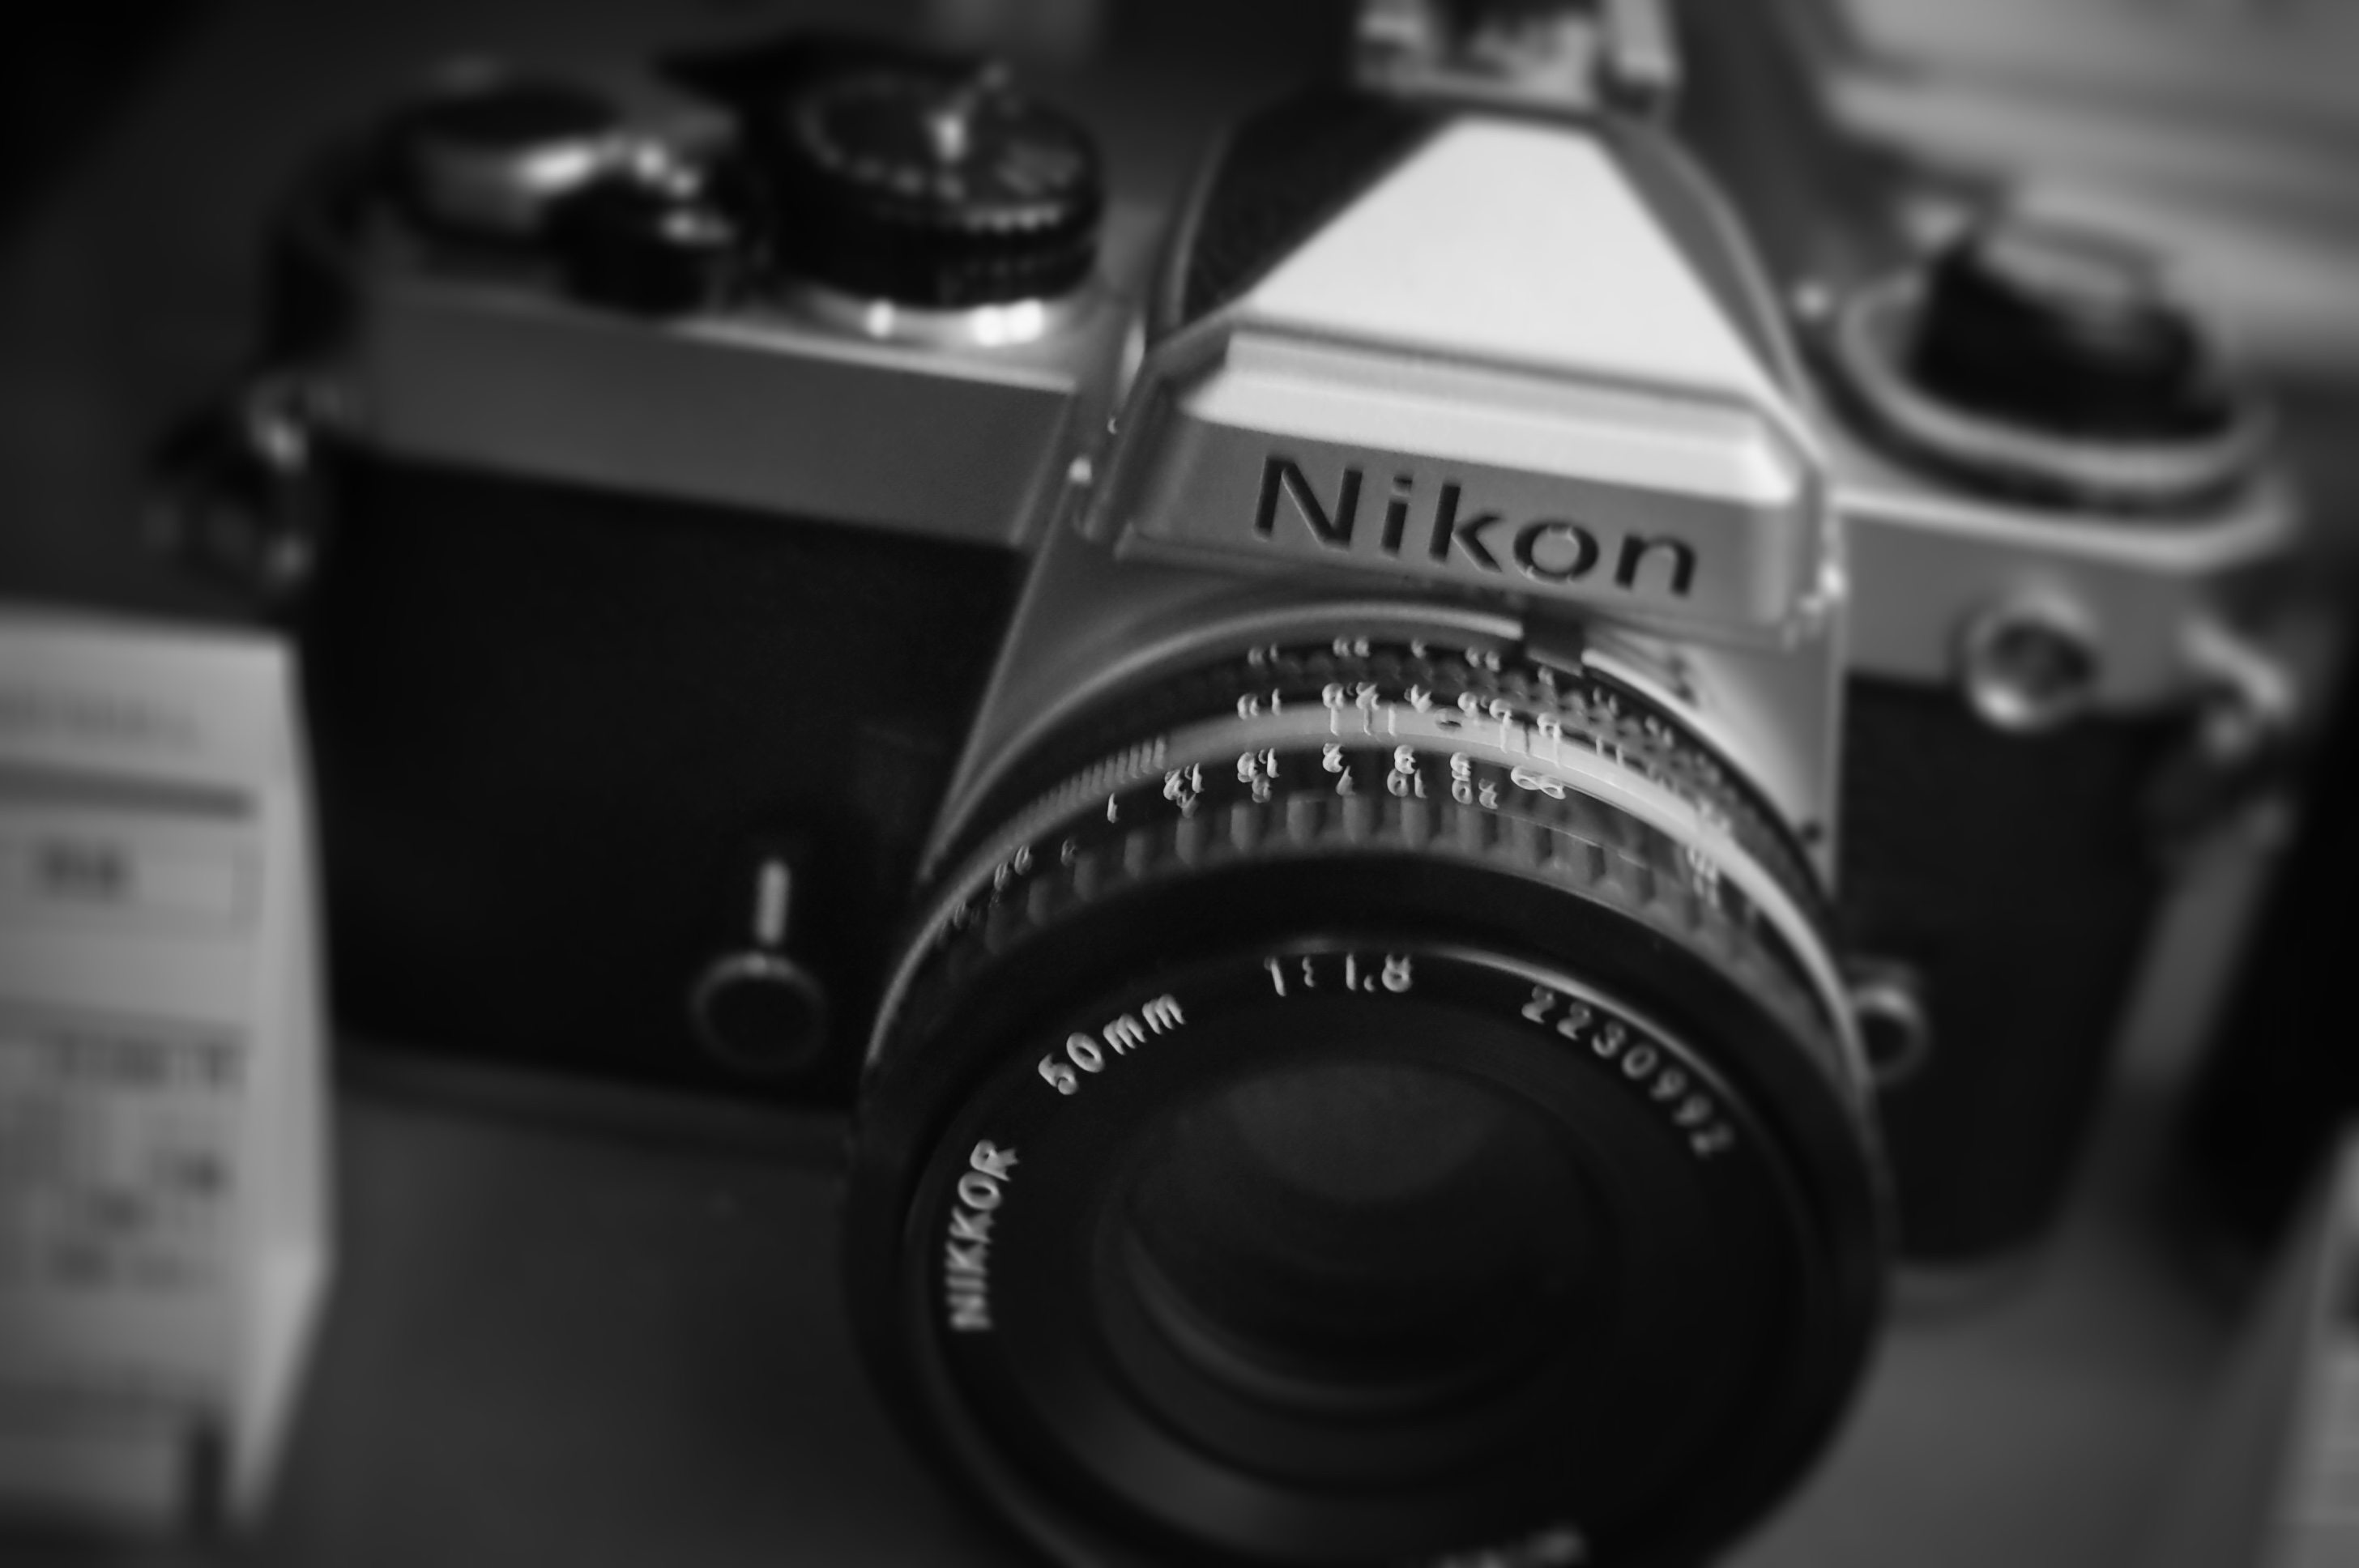 Nikon FE君が僕を見ていた。